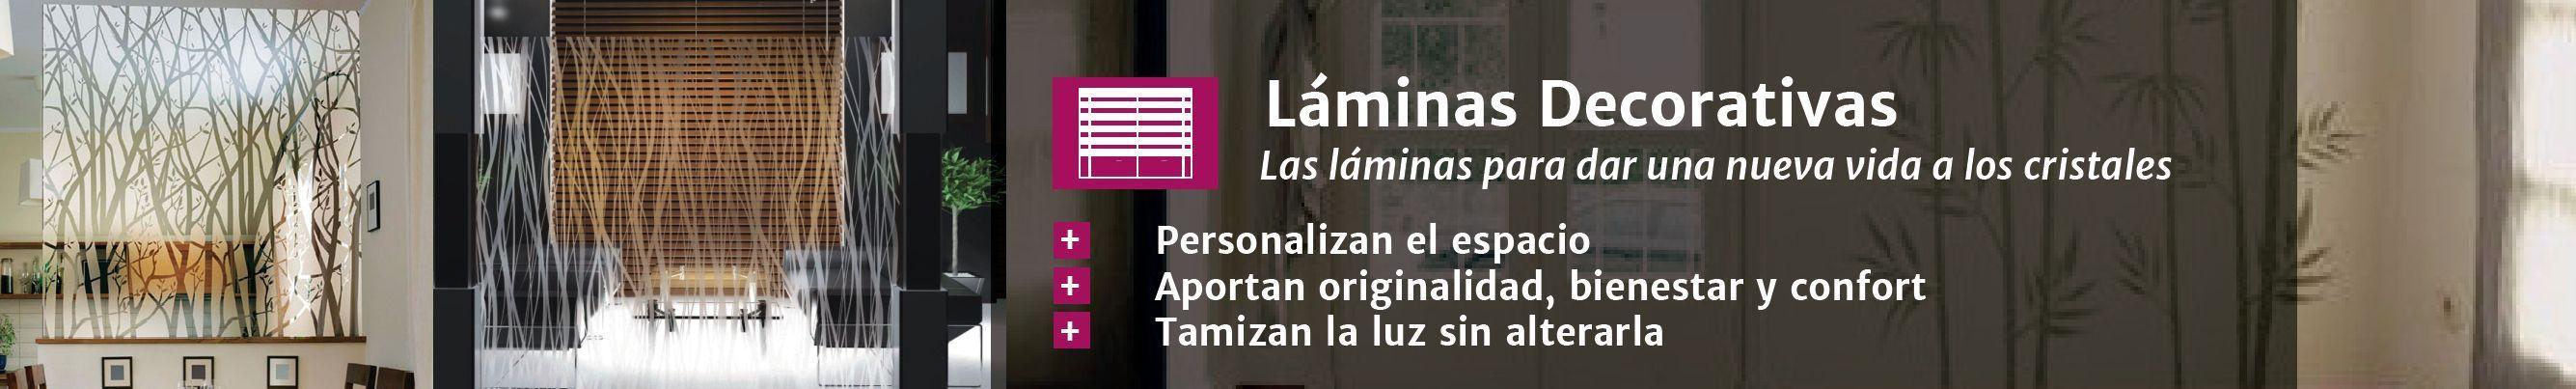 Láminas sdecorativas en Laminotech